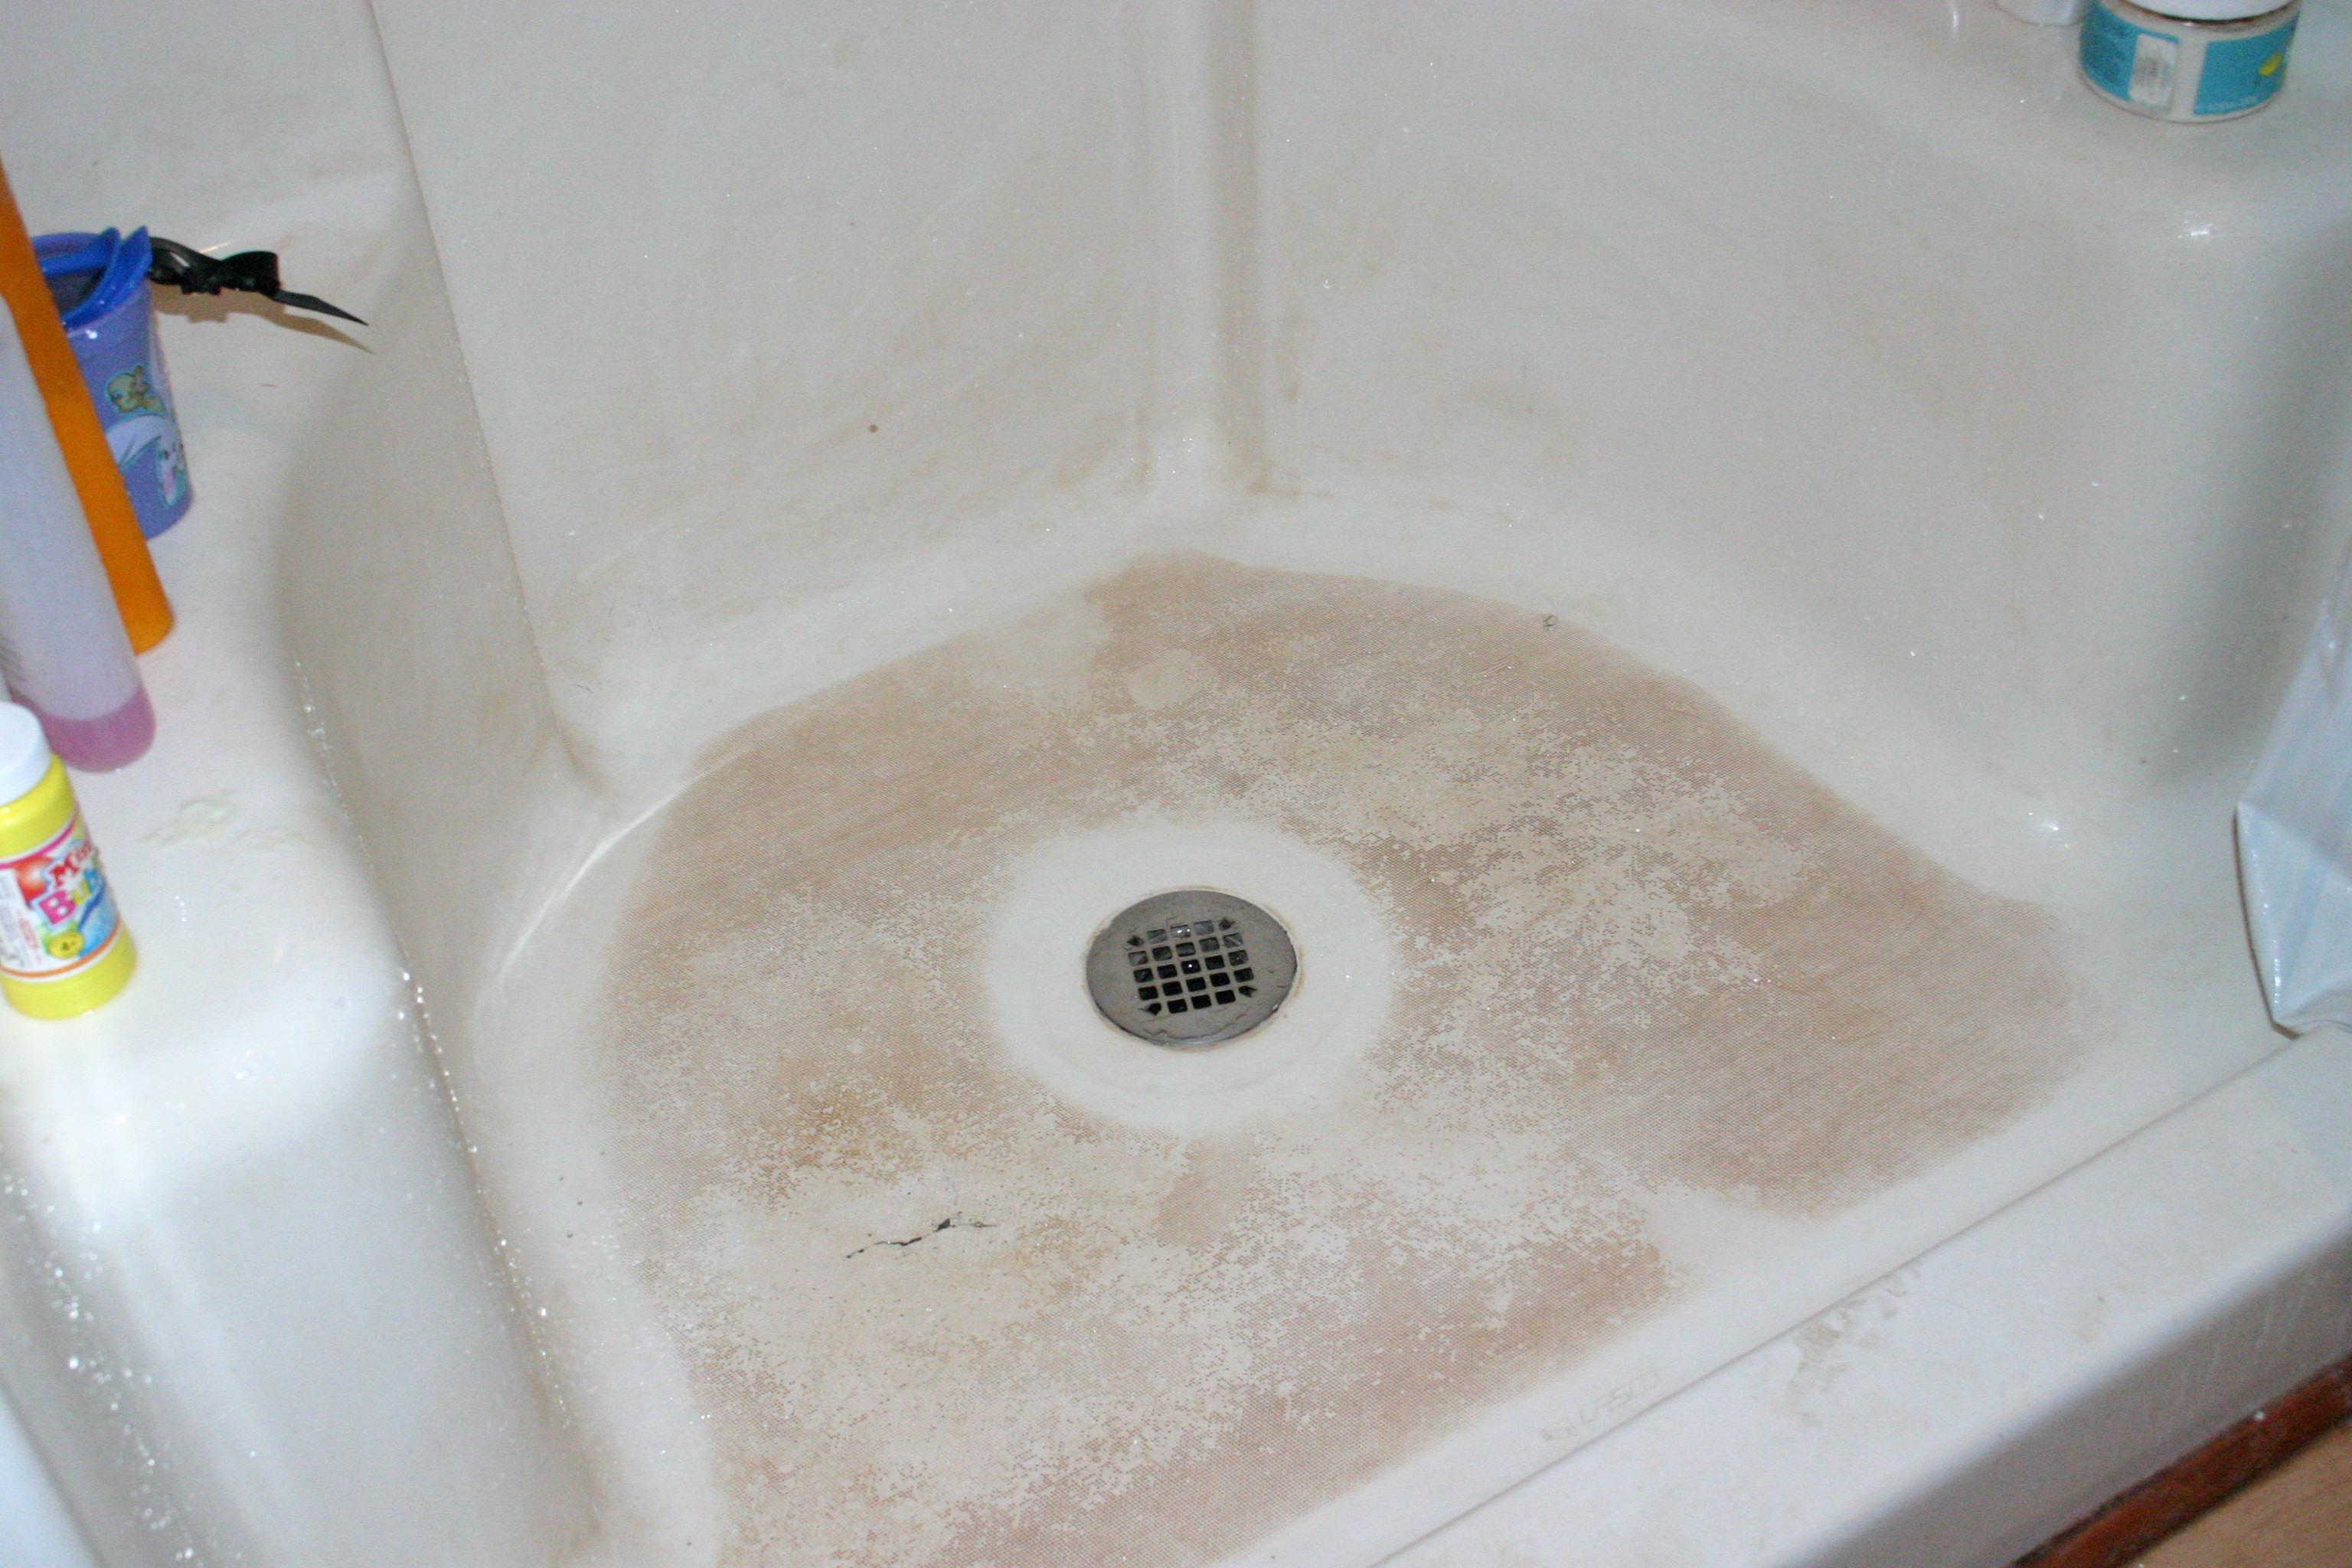 Shower Soap Scum And Dirt Active Moms Nutrition